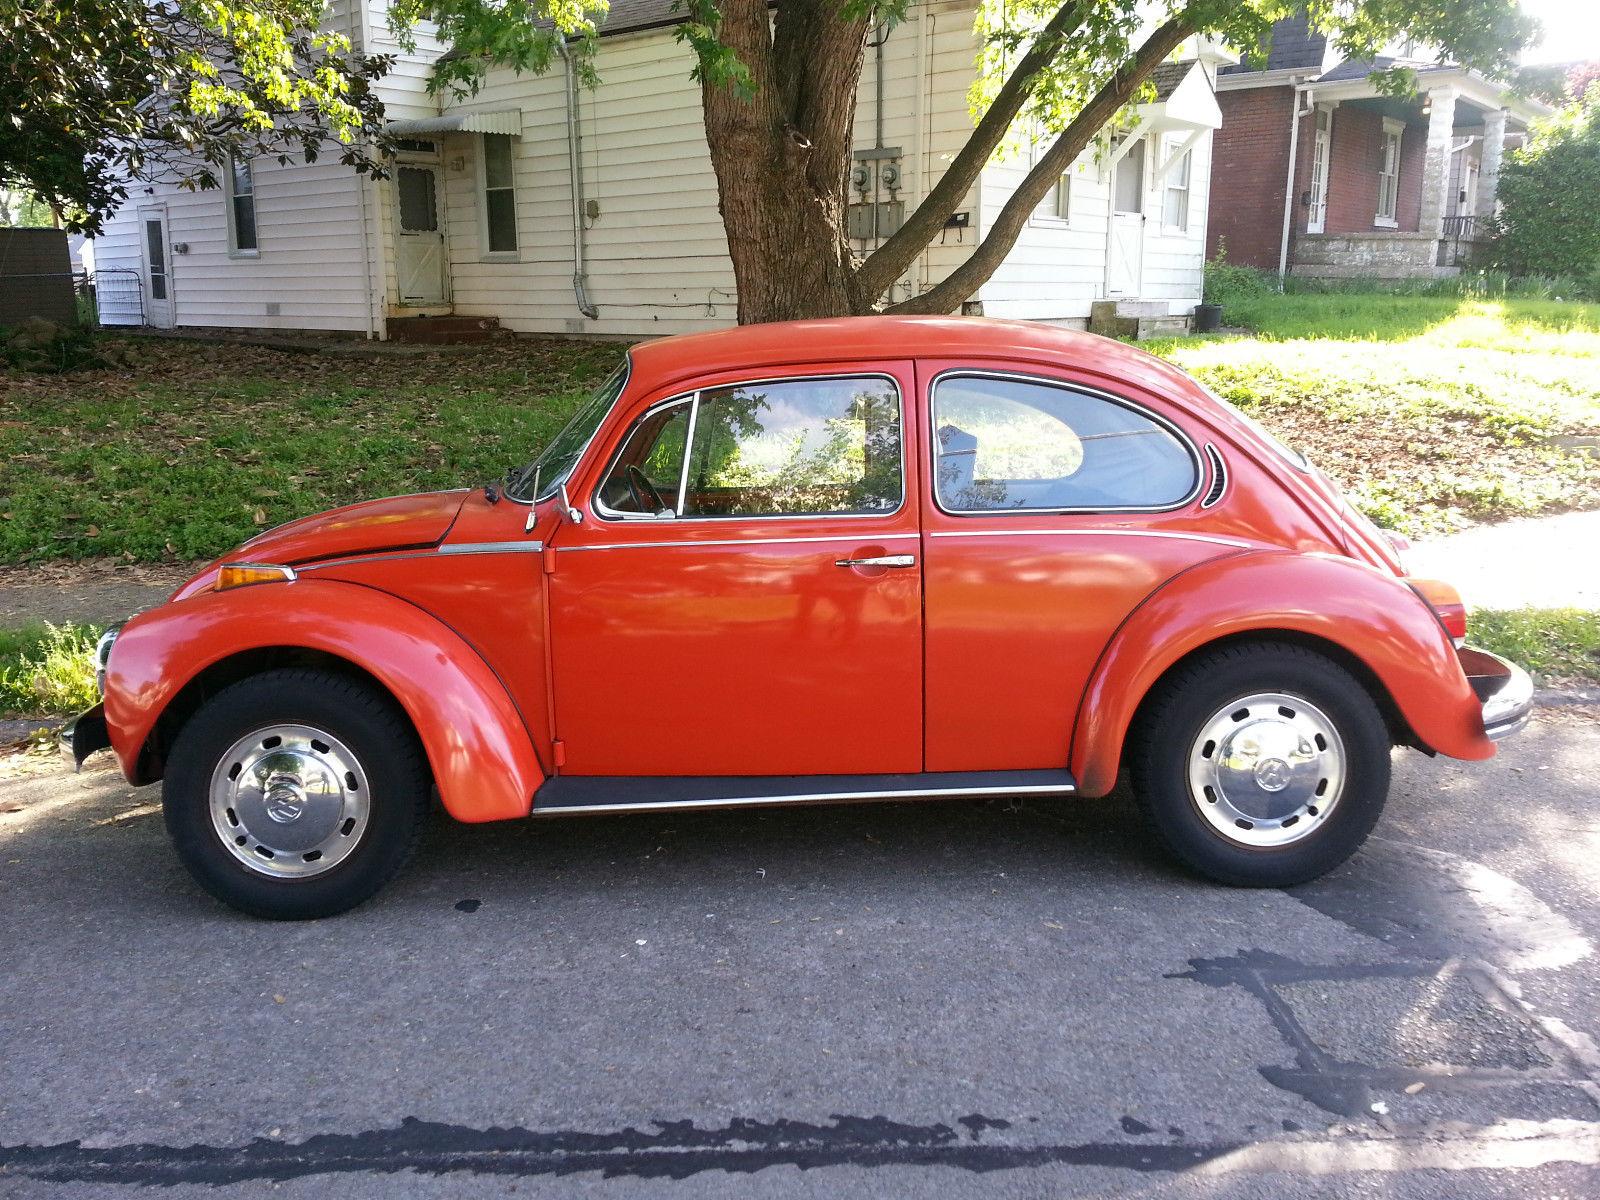 Orange Volkswagen Vw Super Beetle Vintage Classic Volkswagen Beetle Classic 1973 For Sale